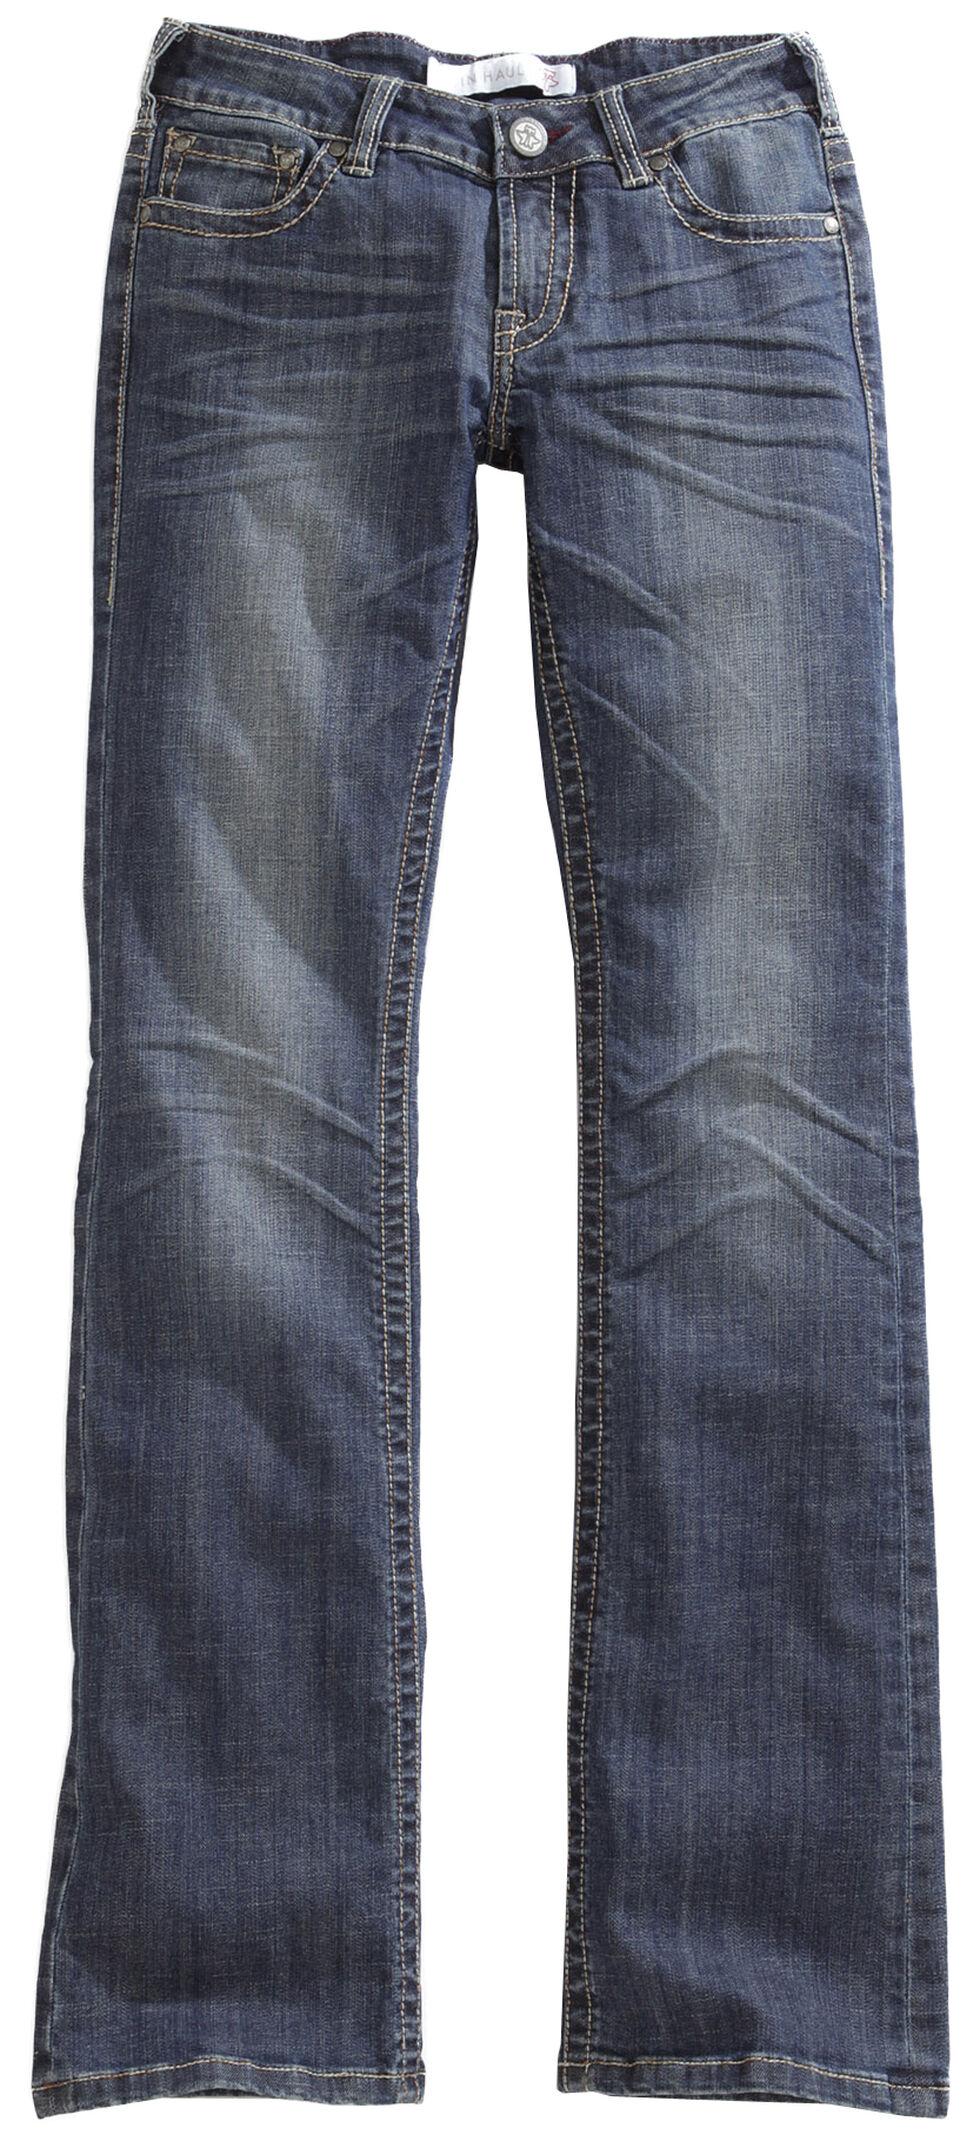 Tin Haul Women's Dolly Celebrity Star Stitch Bootcut Jeans, Denim, hi-res